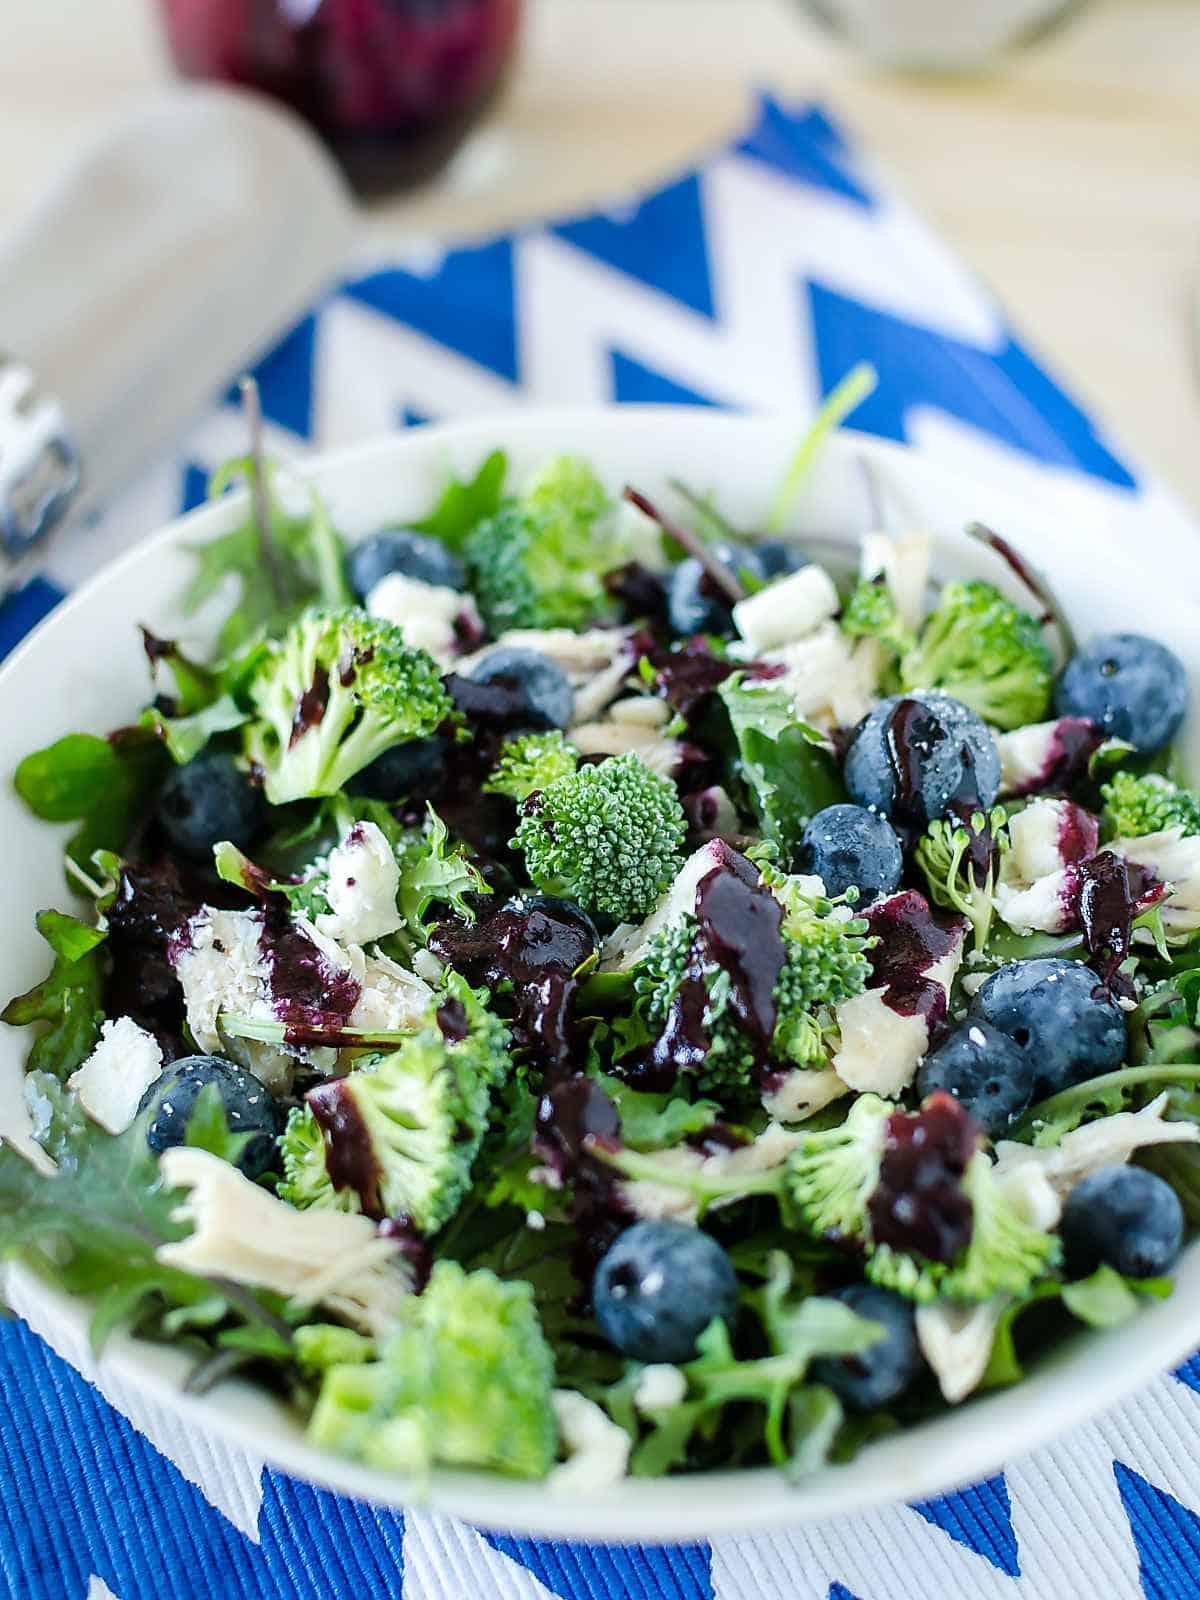 easy broccoli salad recipe with blueberry vinaigrette